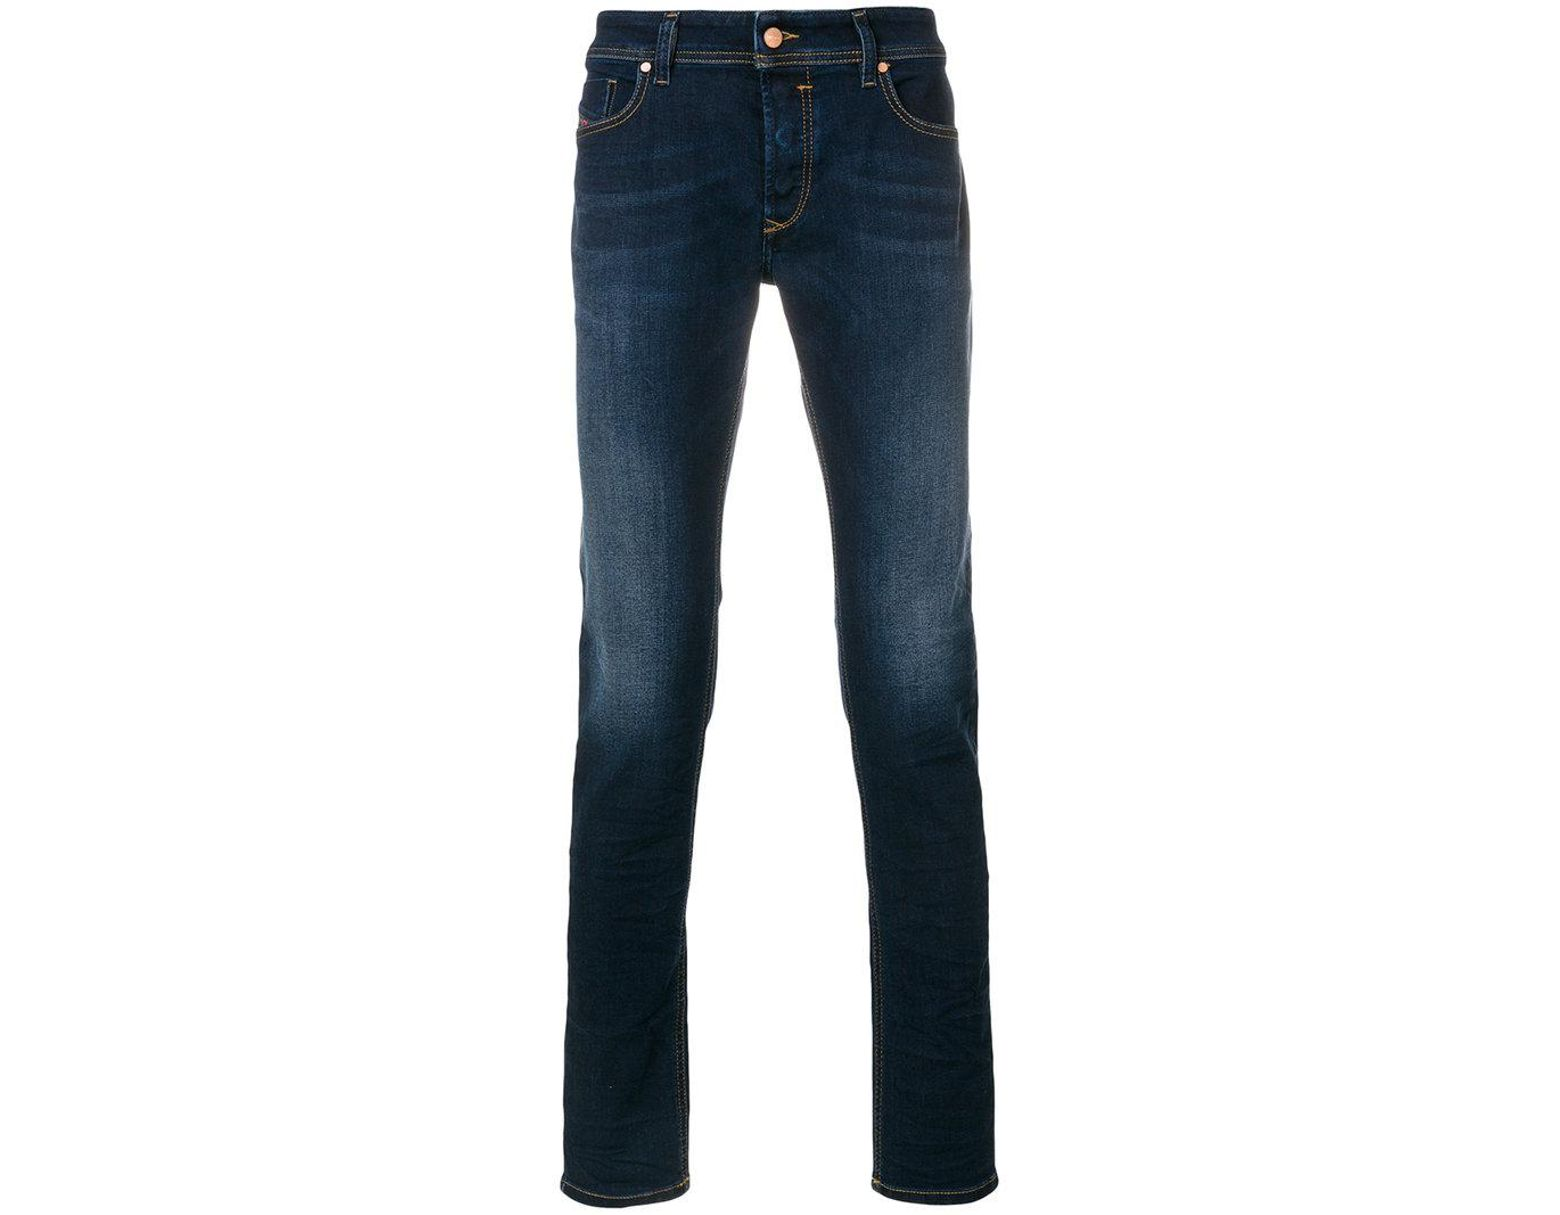 b60b2ddb DIESEL Sleenker 084ri Jeans in Blue for Men - Lyst